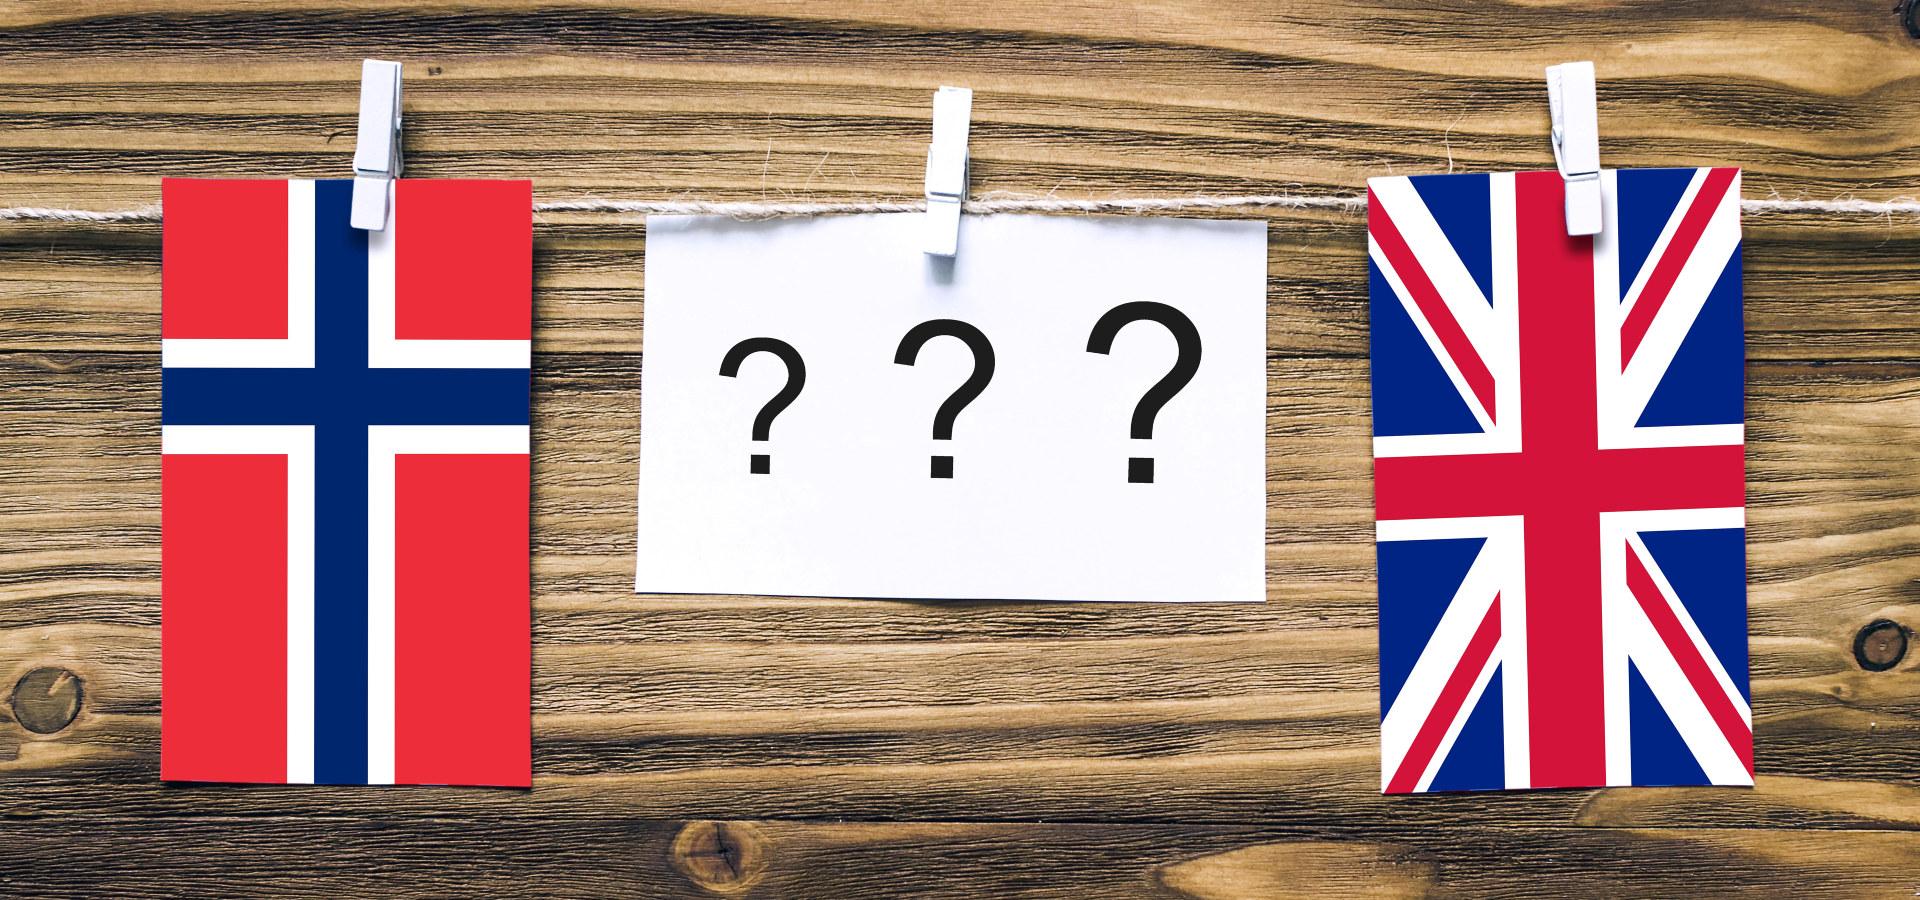 Flagg fra Storbritannia og Norge